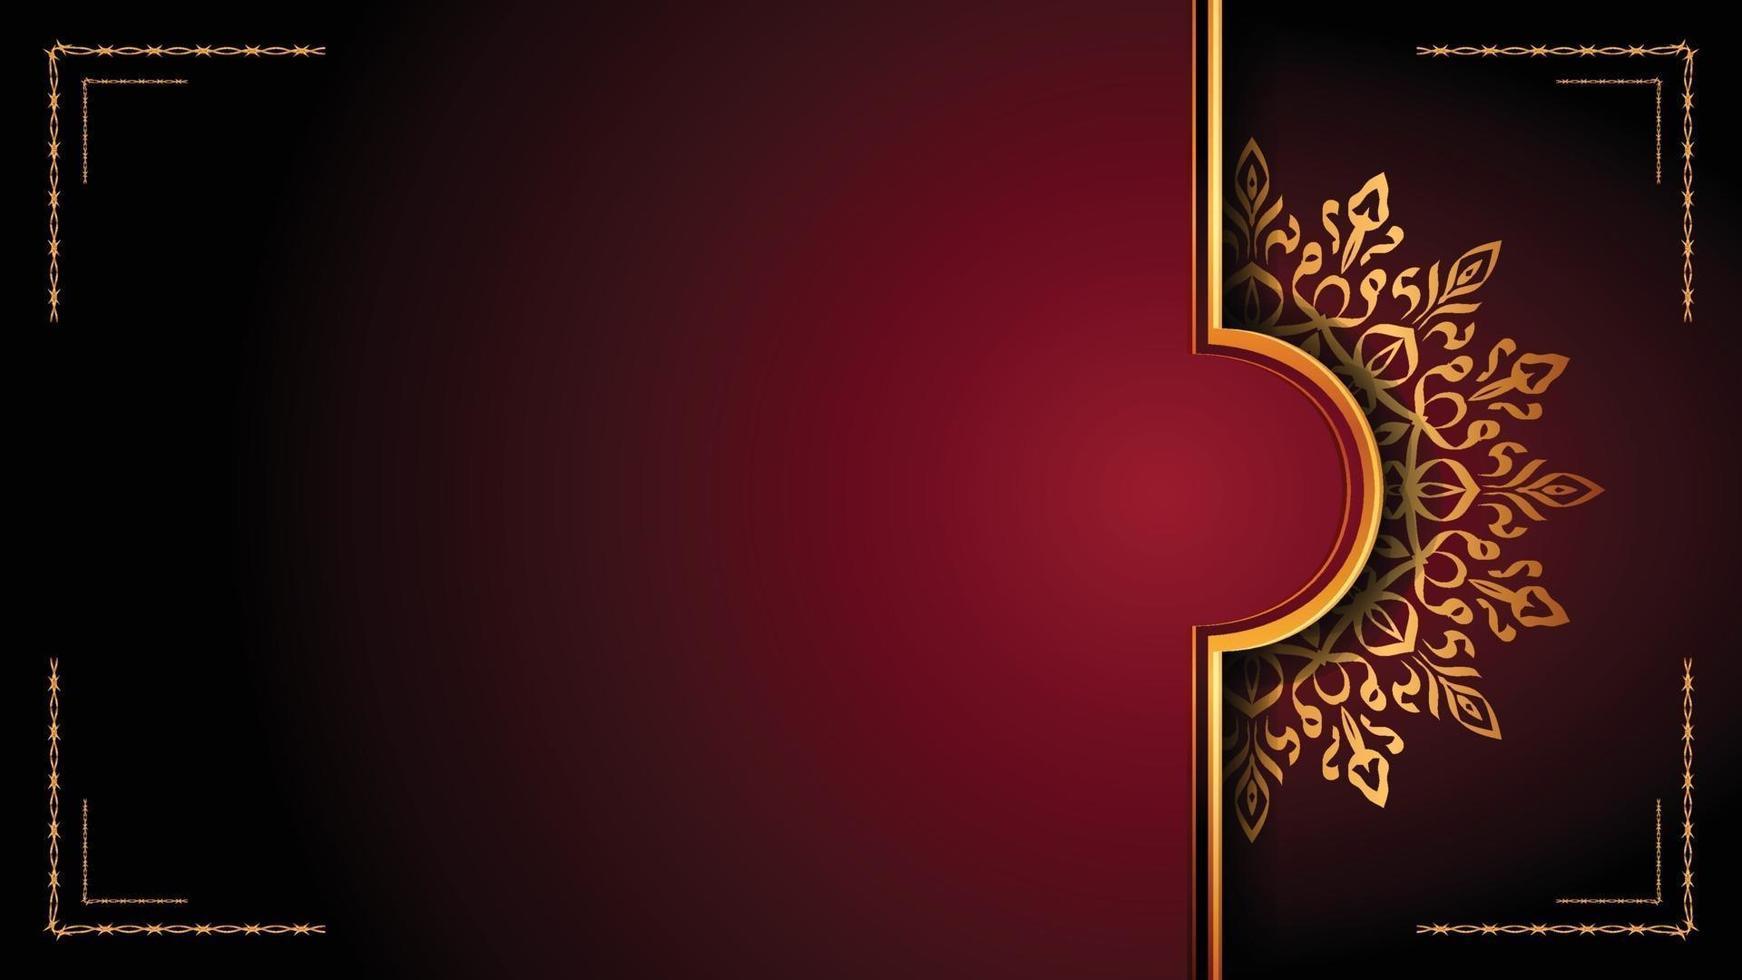 diseño de fondo ornamental de mandala de lujo con estilo de patrón arabesco dorado. Ornamento decorativo de mandala para impresión, folleto, pancarta, portada, póster, tarjeta de invitación. vector